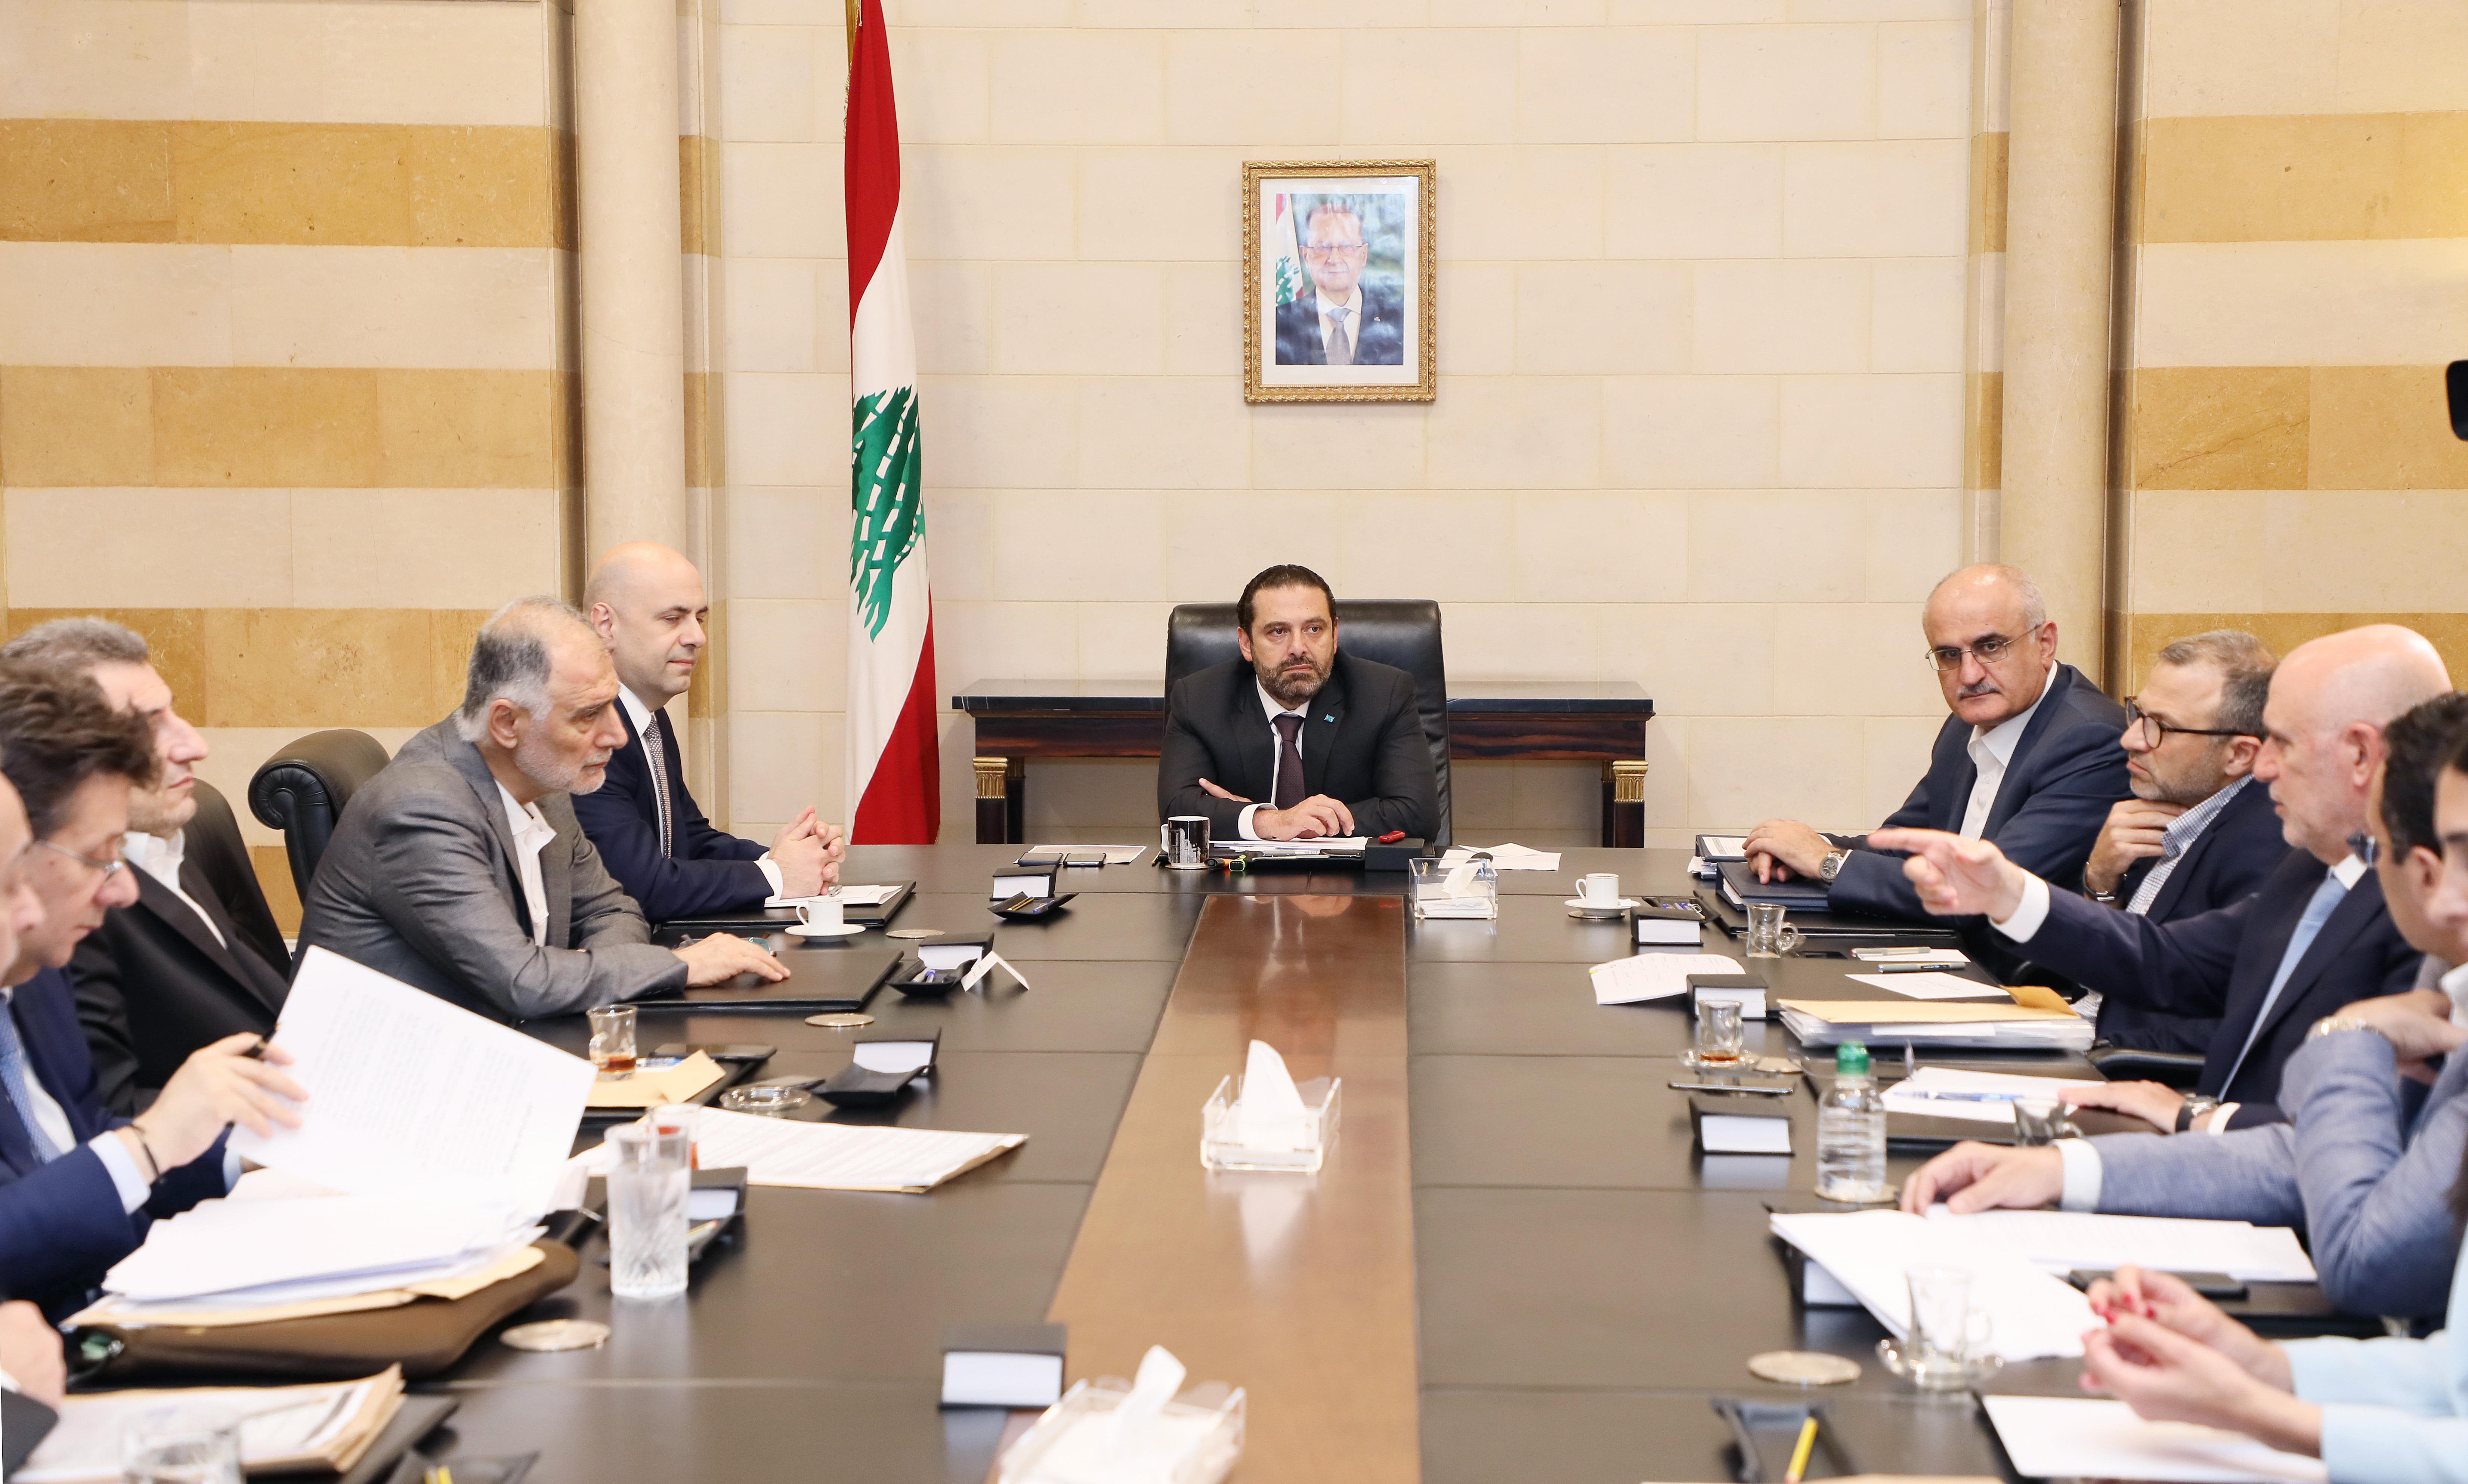 Pr Minister Saad Hariri Heading a Ministerial Council 1